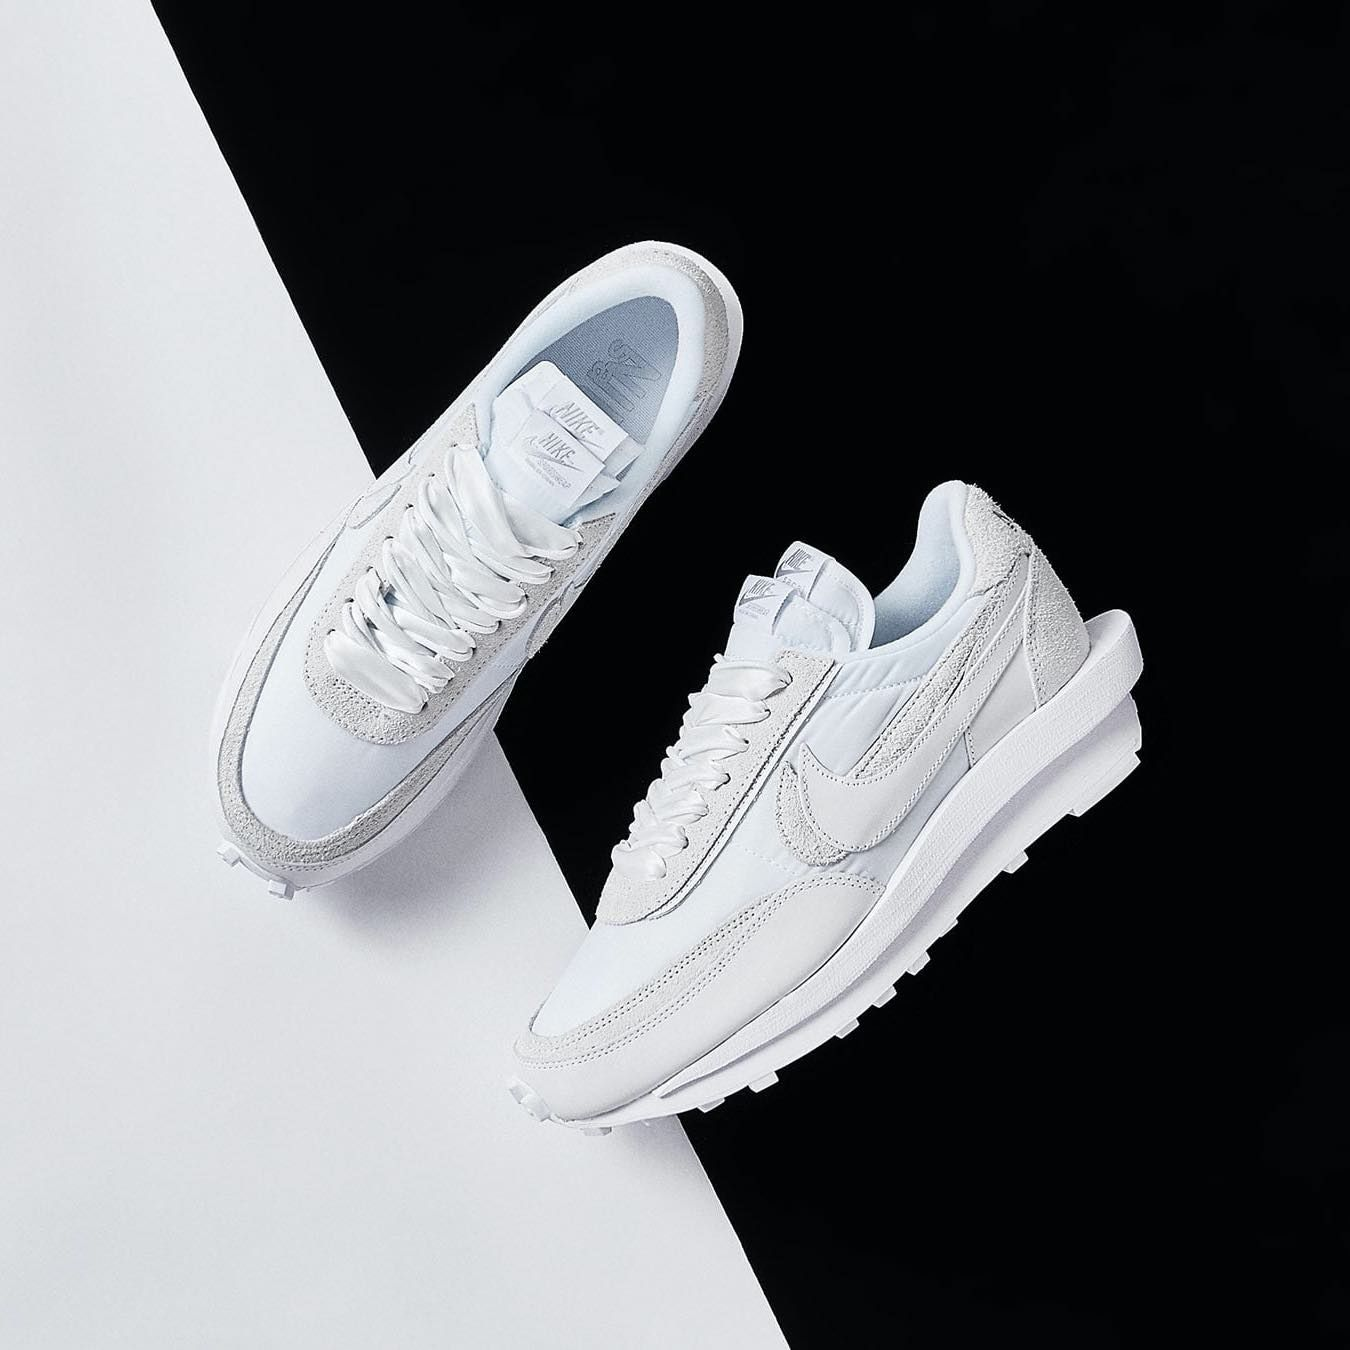 Sacai x Nike LDV Waffle White